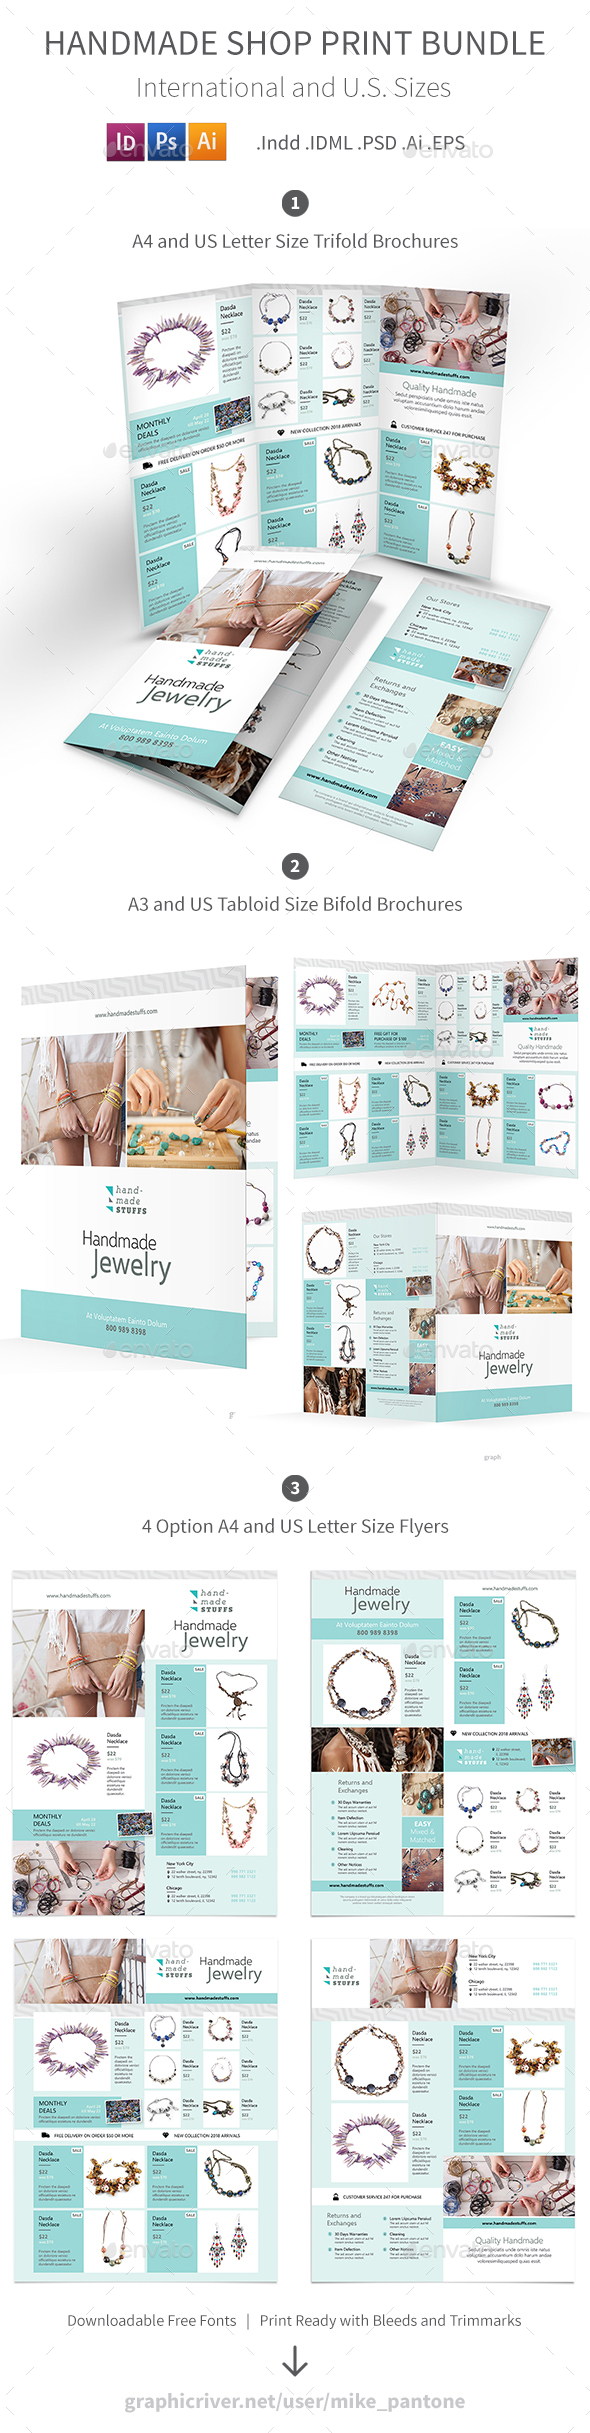 Handmade Shop Print Bundle - Informational Brochures